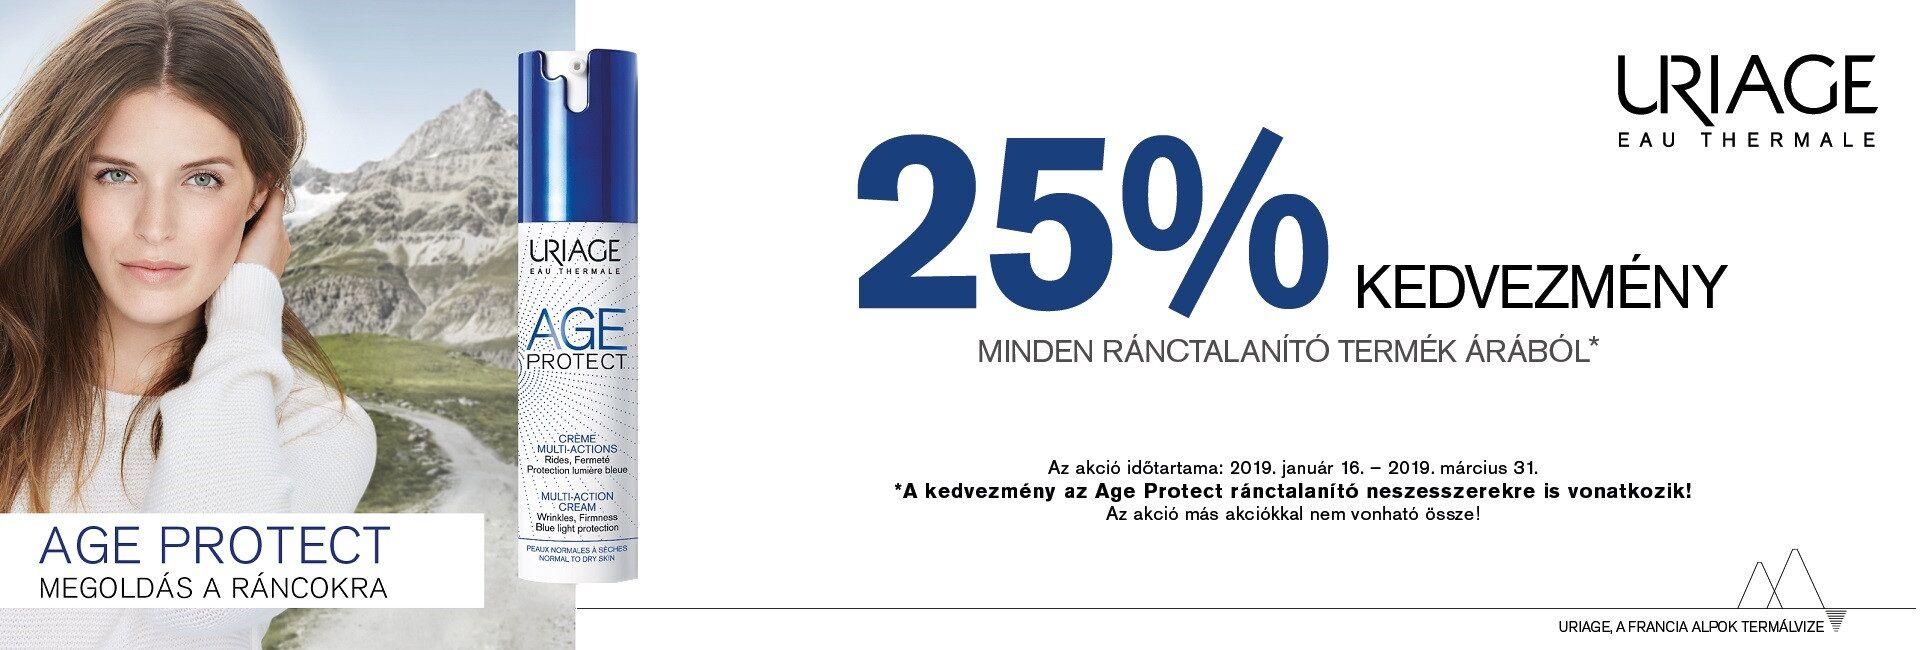 2019. március 31-ig minden Uriage Age Protect termékre 25% kedvezményt adunk!